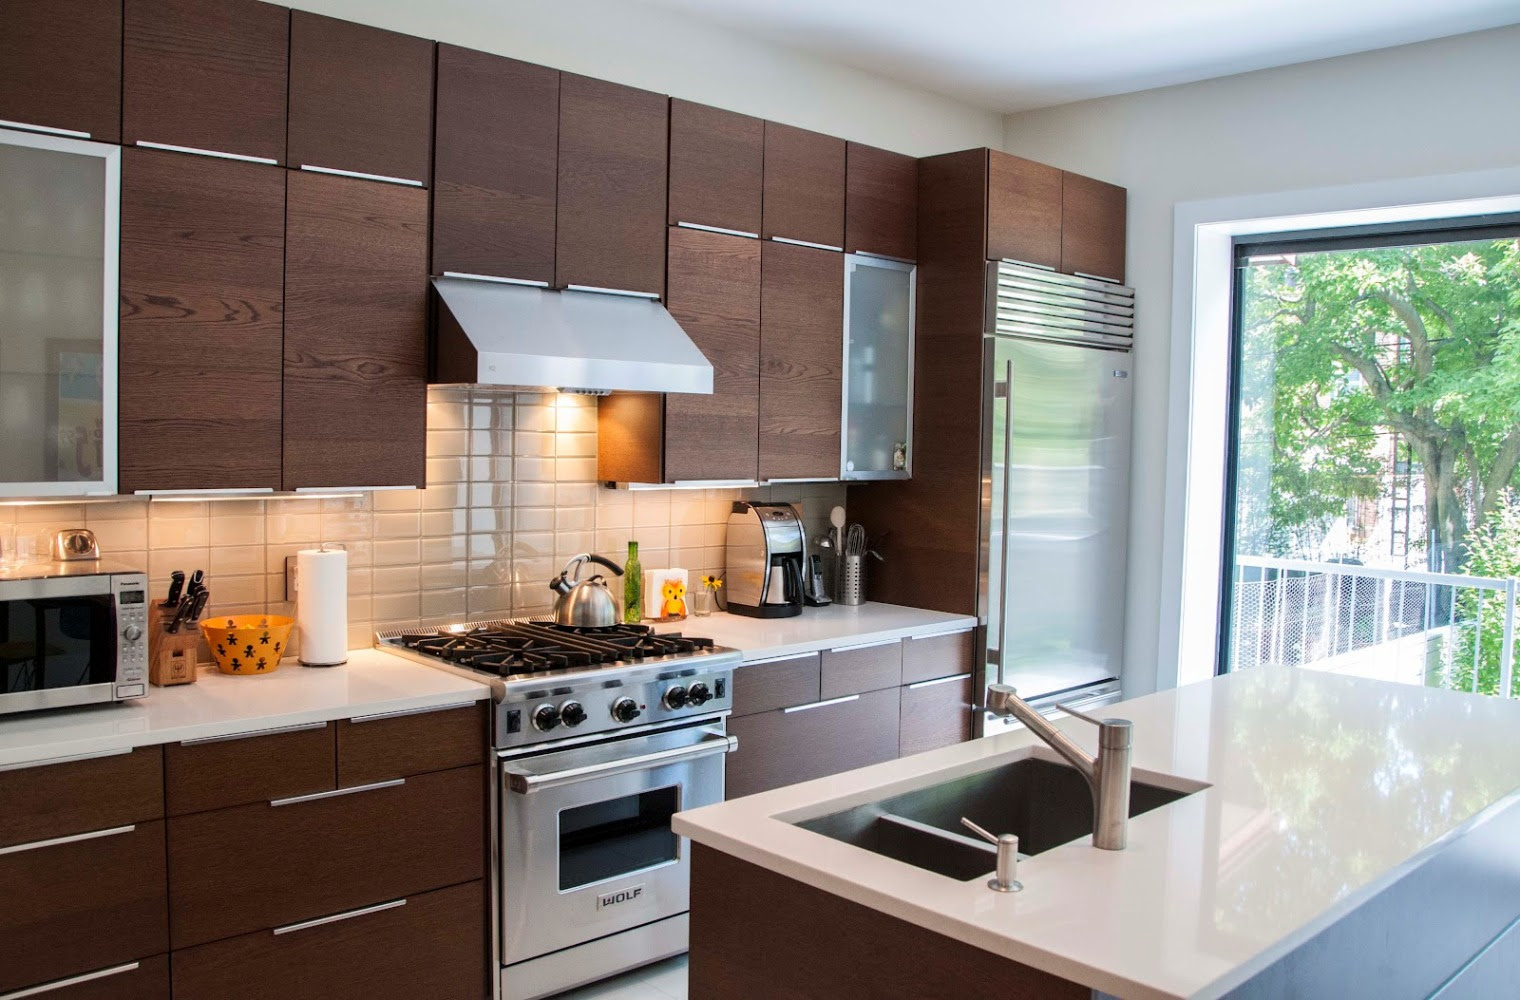 Minimalist IKEA Kitchen Cabinet Selection in Lighter Tone ...